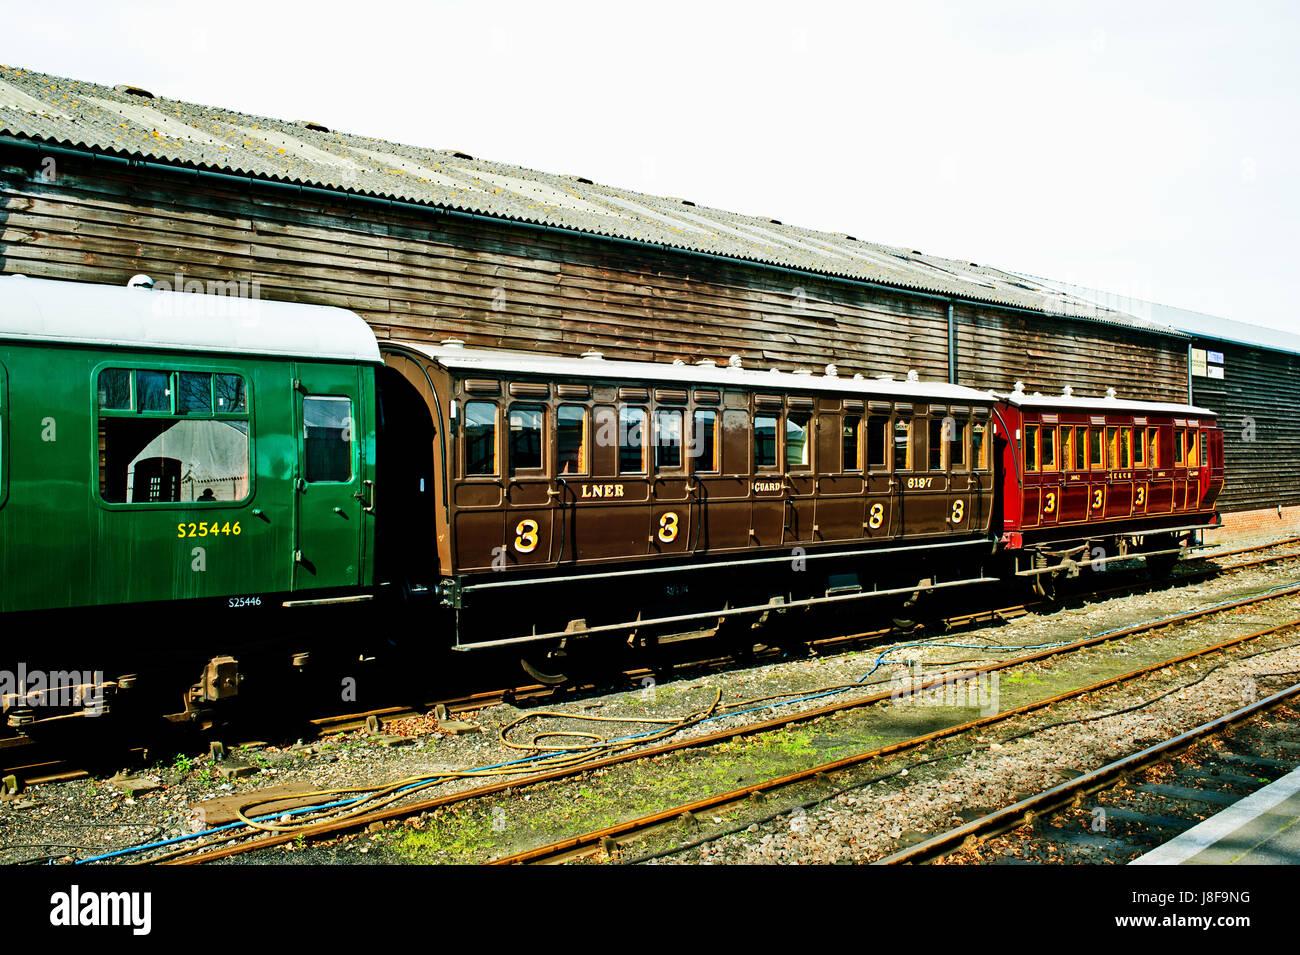 Vintage coaches, Tenterden railway station, tentergden Kent - Stock Image